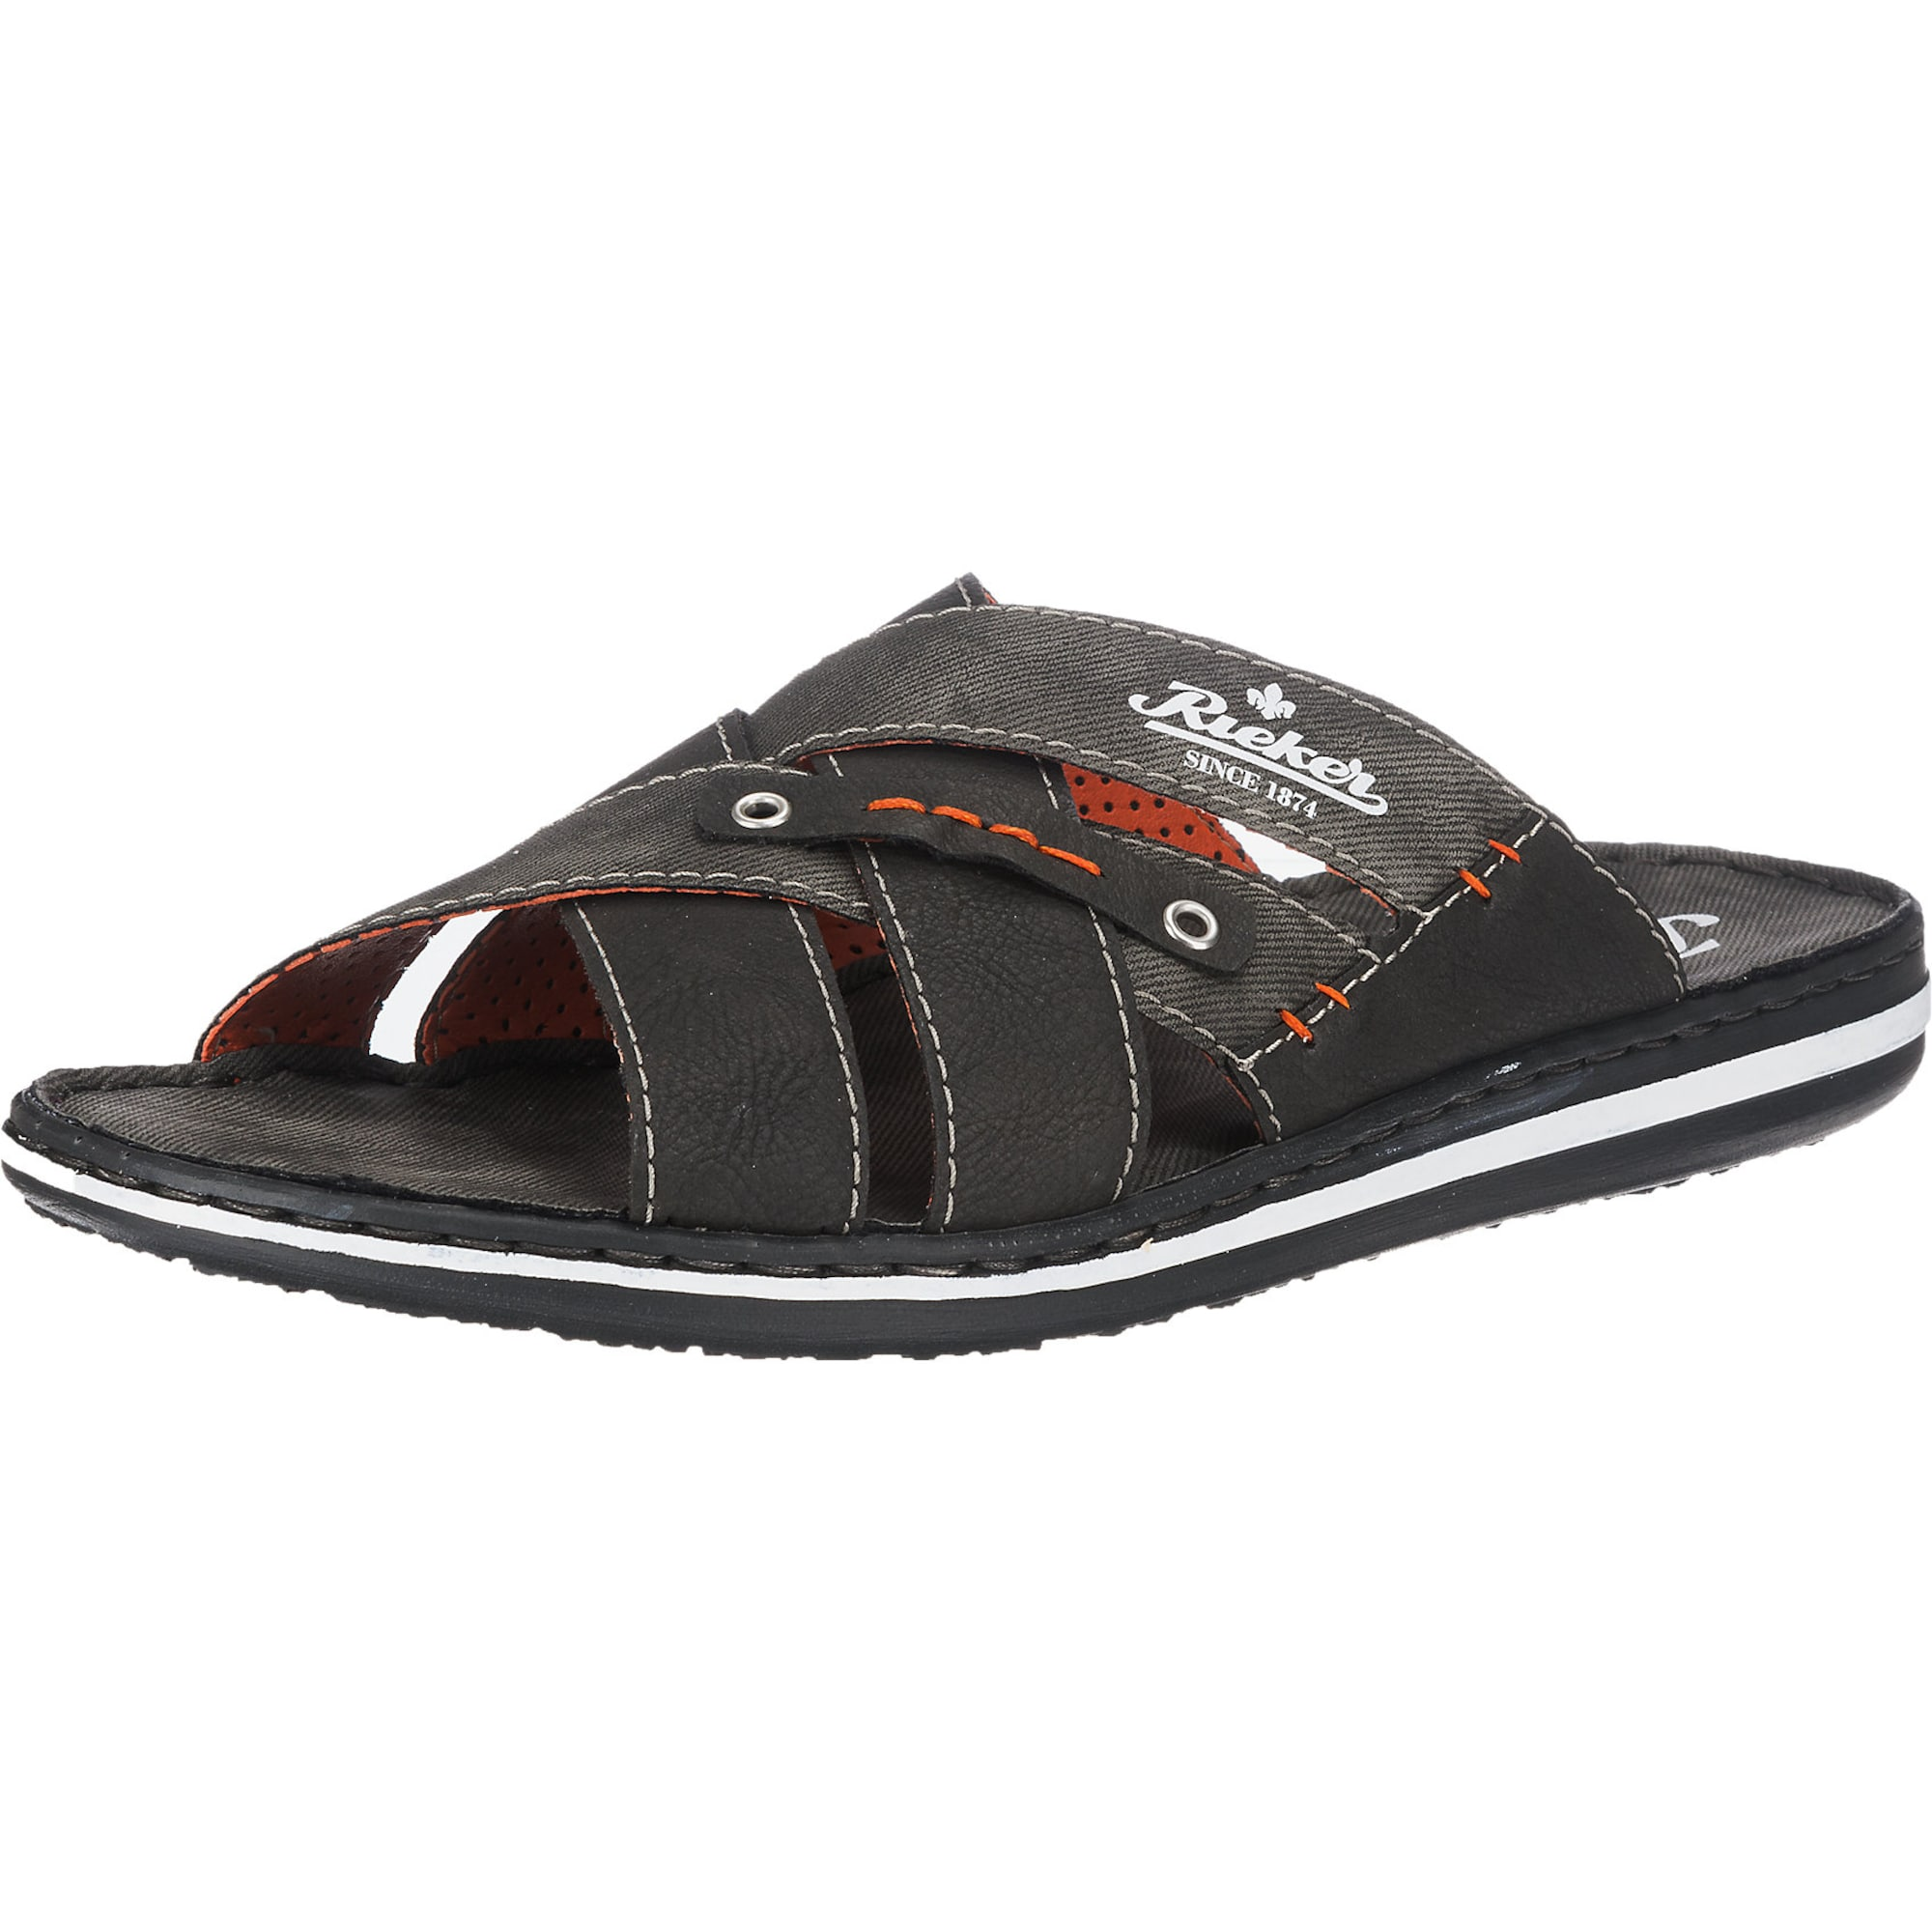 Pantoletten | Schuhe > Clogs & Pantoletten > Pantoletten | Graphit - Orange - Weiß | RIEKER